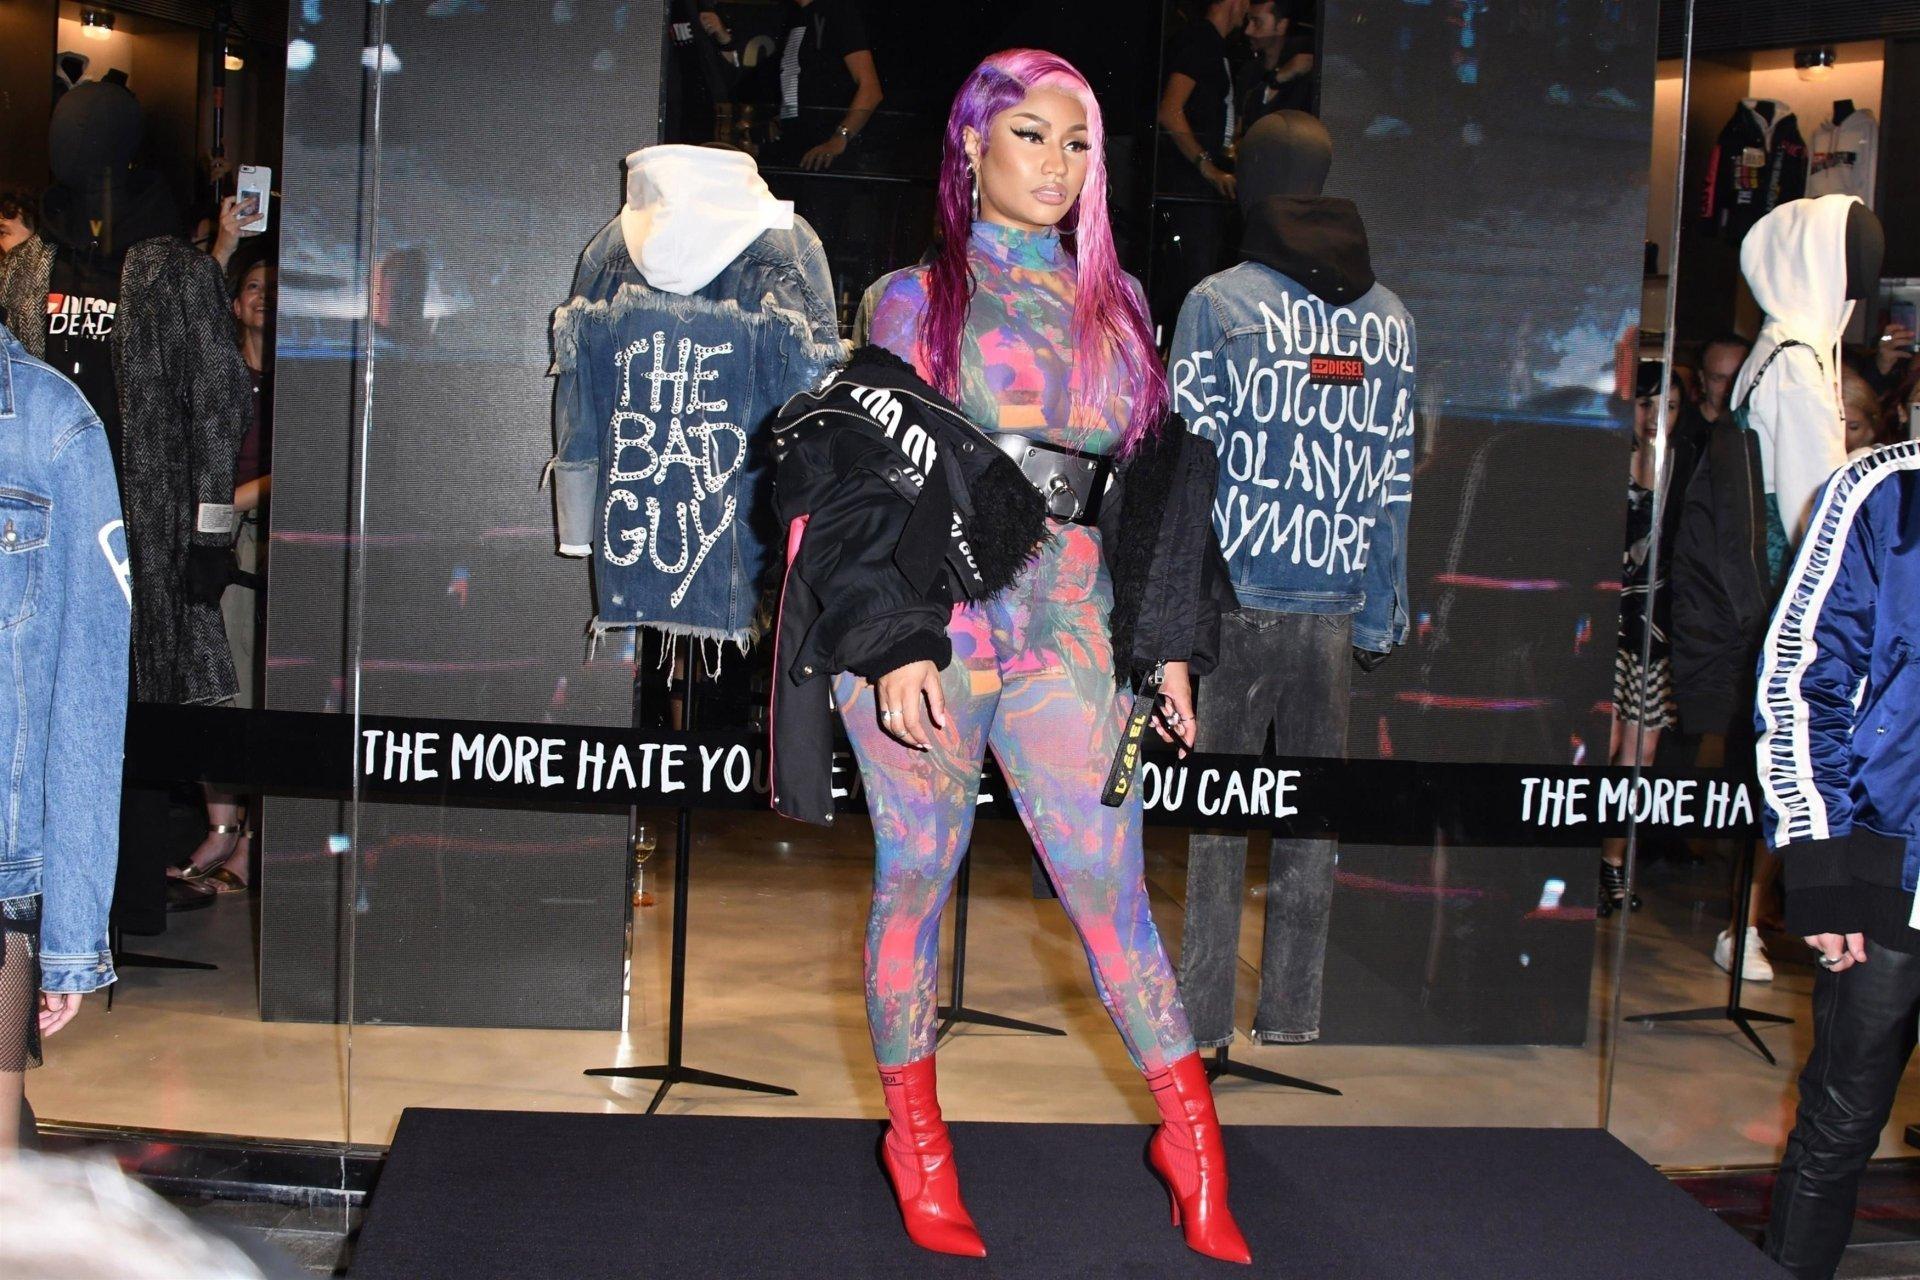 Nicki-Minaj-See-Through-TheFappeningBlog.com-11.jpg